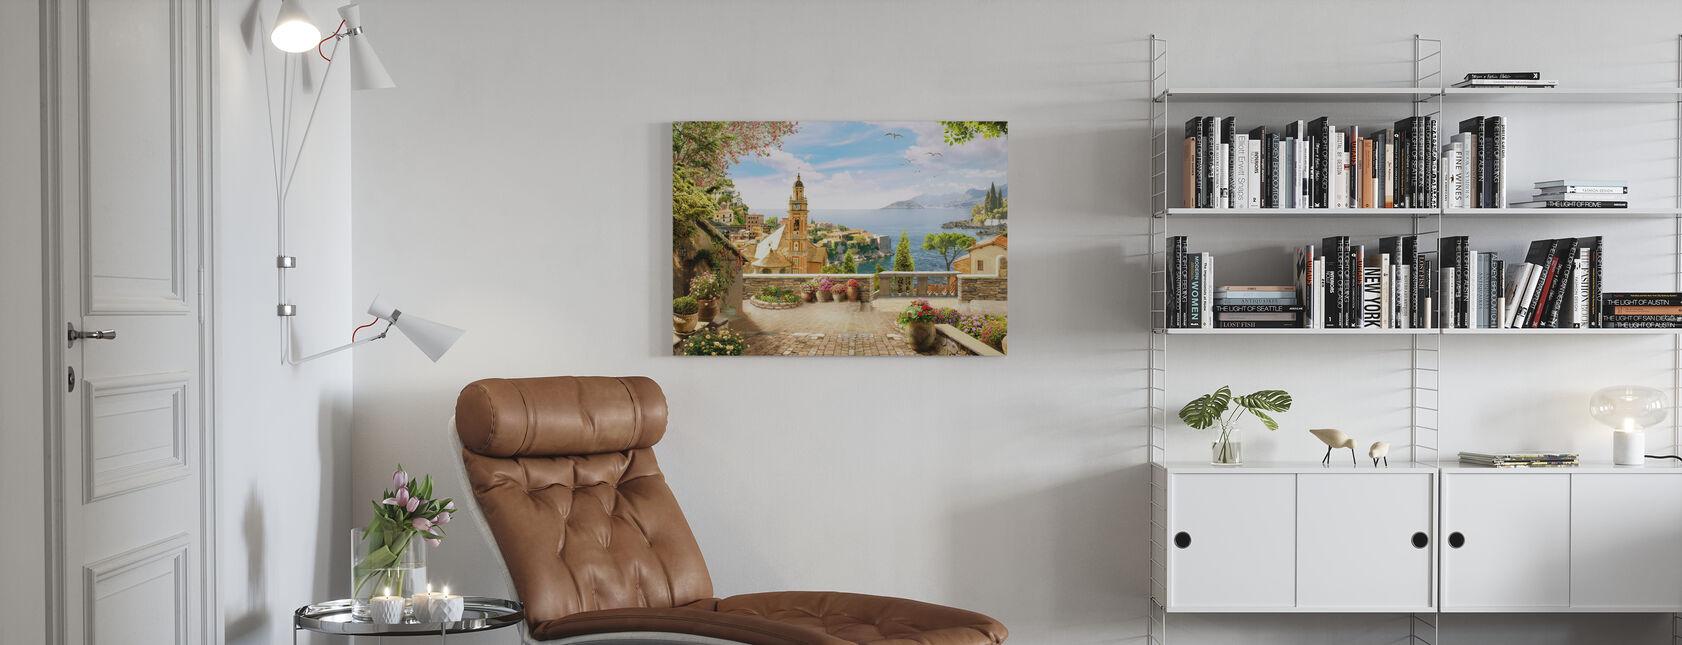 Atemberaubender Blick auf Amalfi - Leinwandbild - Wohnzimmer